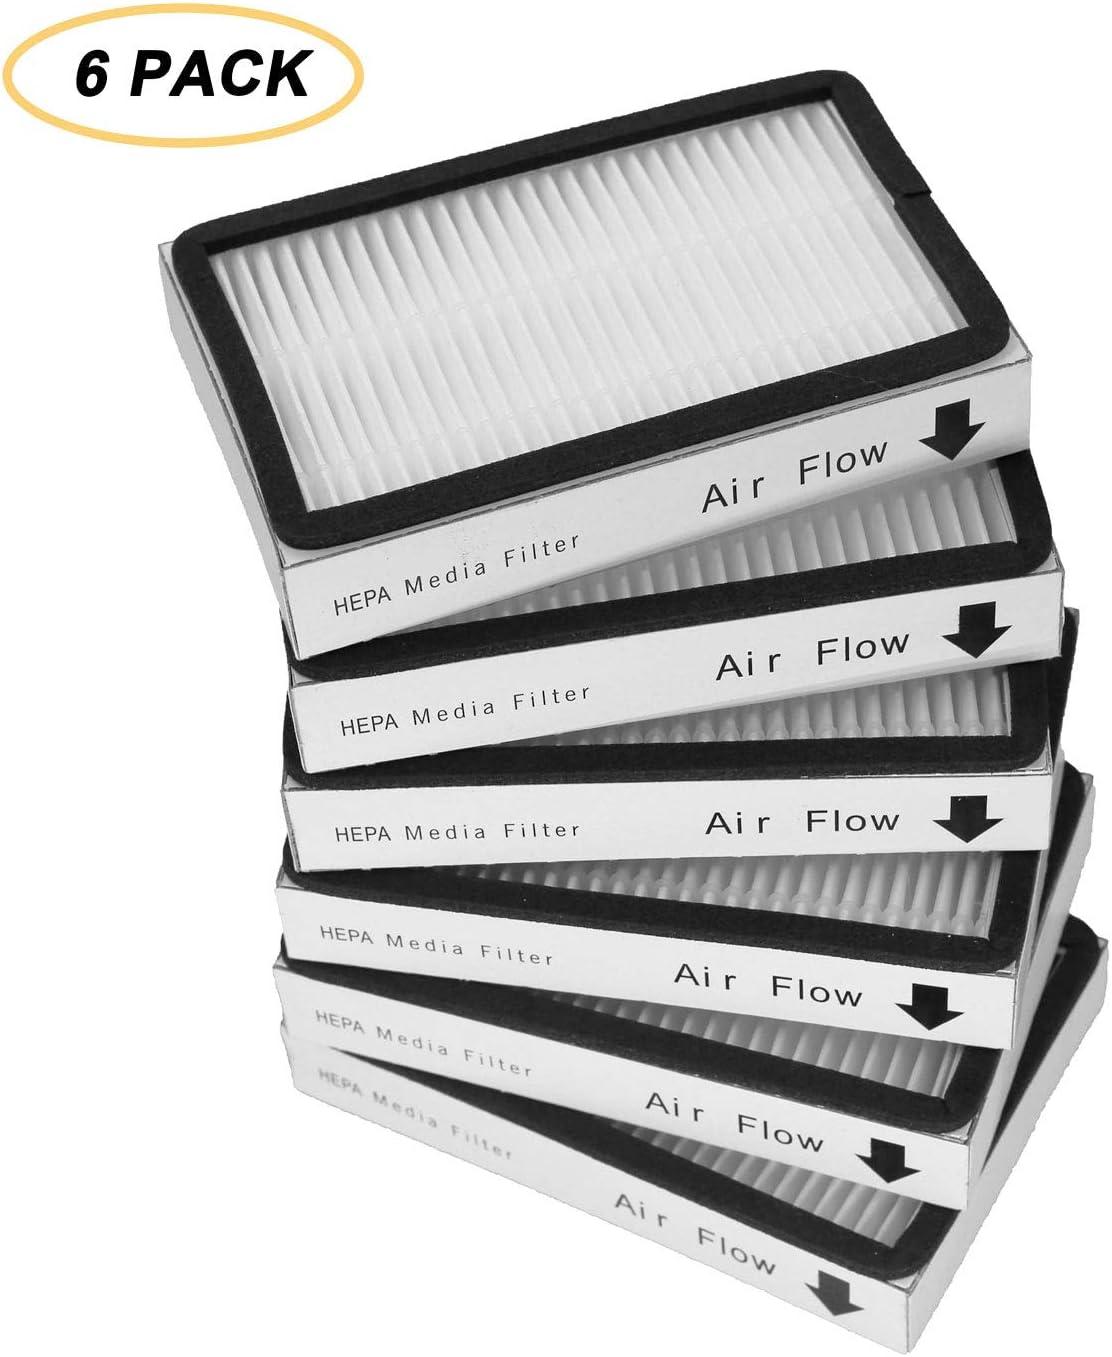 IOYIJOI 6 Pack Exhaust Vacuum 86880 Hepa Filters for Kenmore EF-2, 86880, 20-86880, 610445 Sears Vacuum Cleaners, Panasonic (MC-V194H)